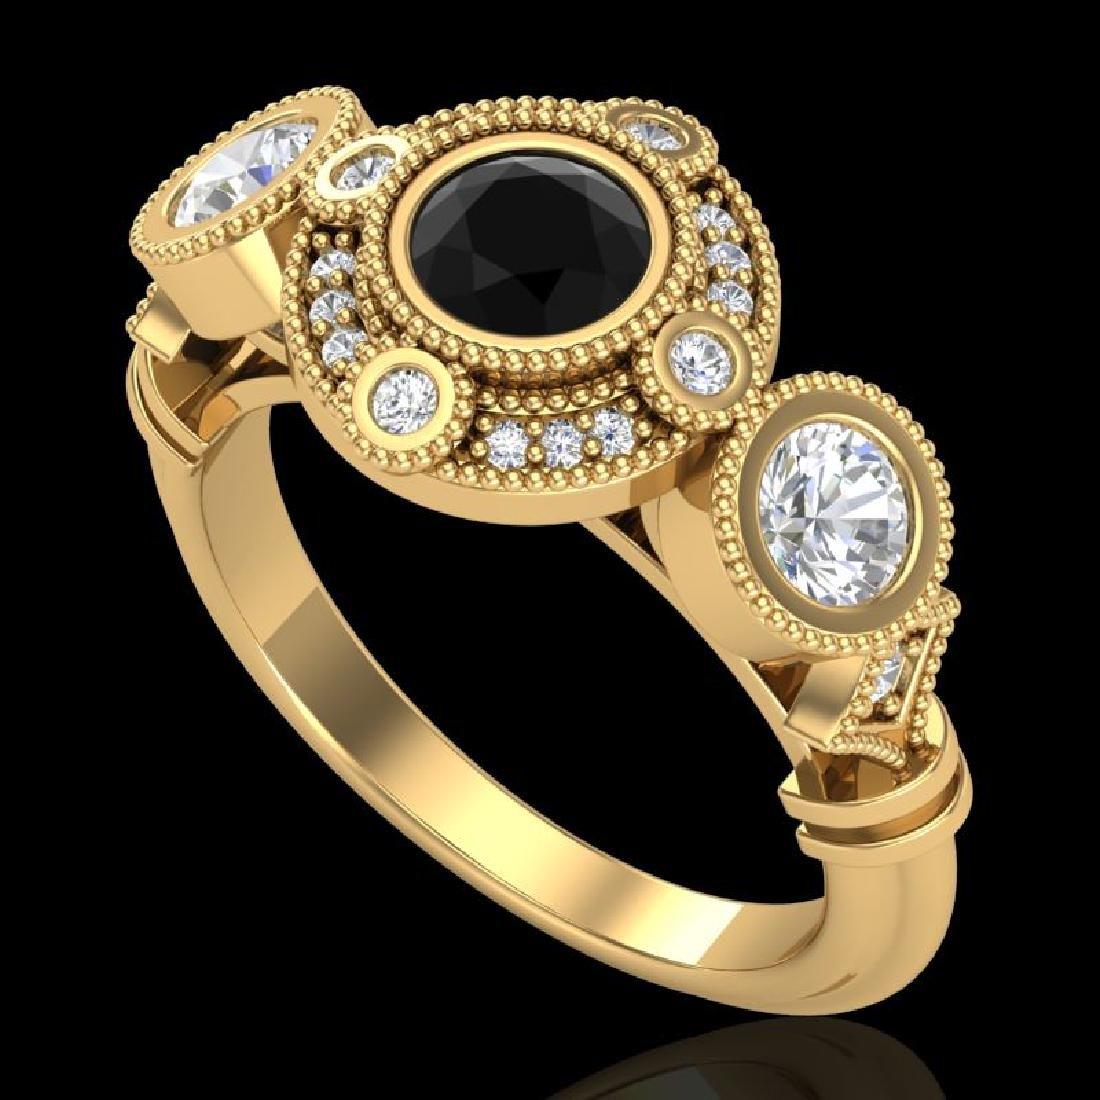 1.51 CTW Fancy Black Diamond Solitaire Art Deco 3 Stone